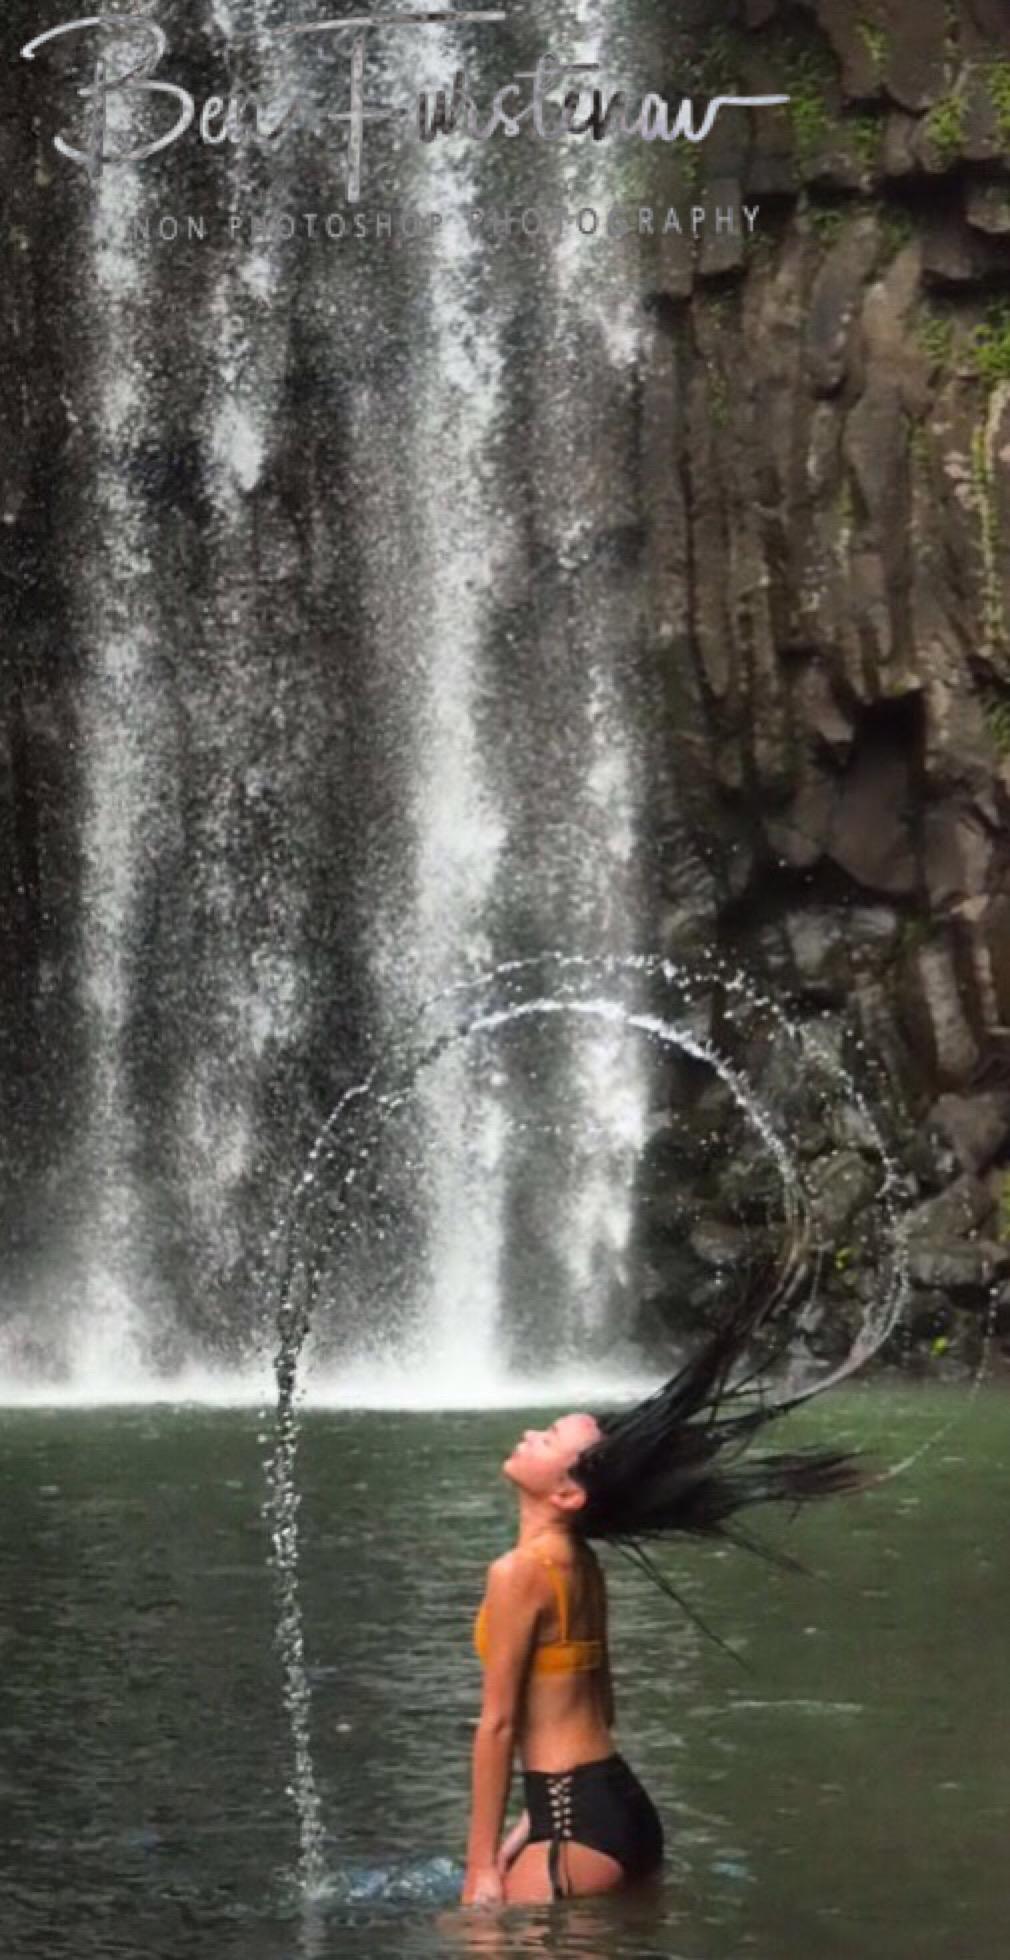 Perfect circle at Millaa Millaa Falls, Atherton Tablelands, Far North Queensland, Australia